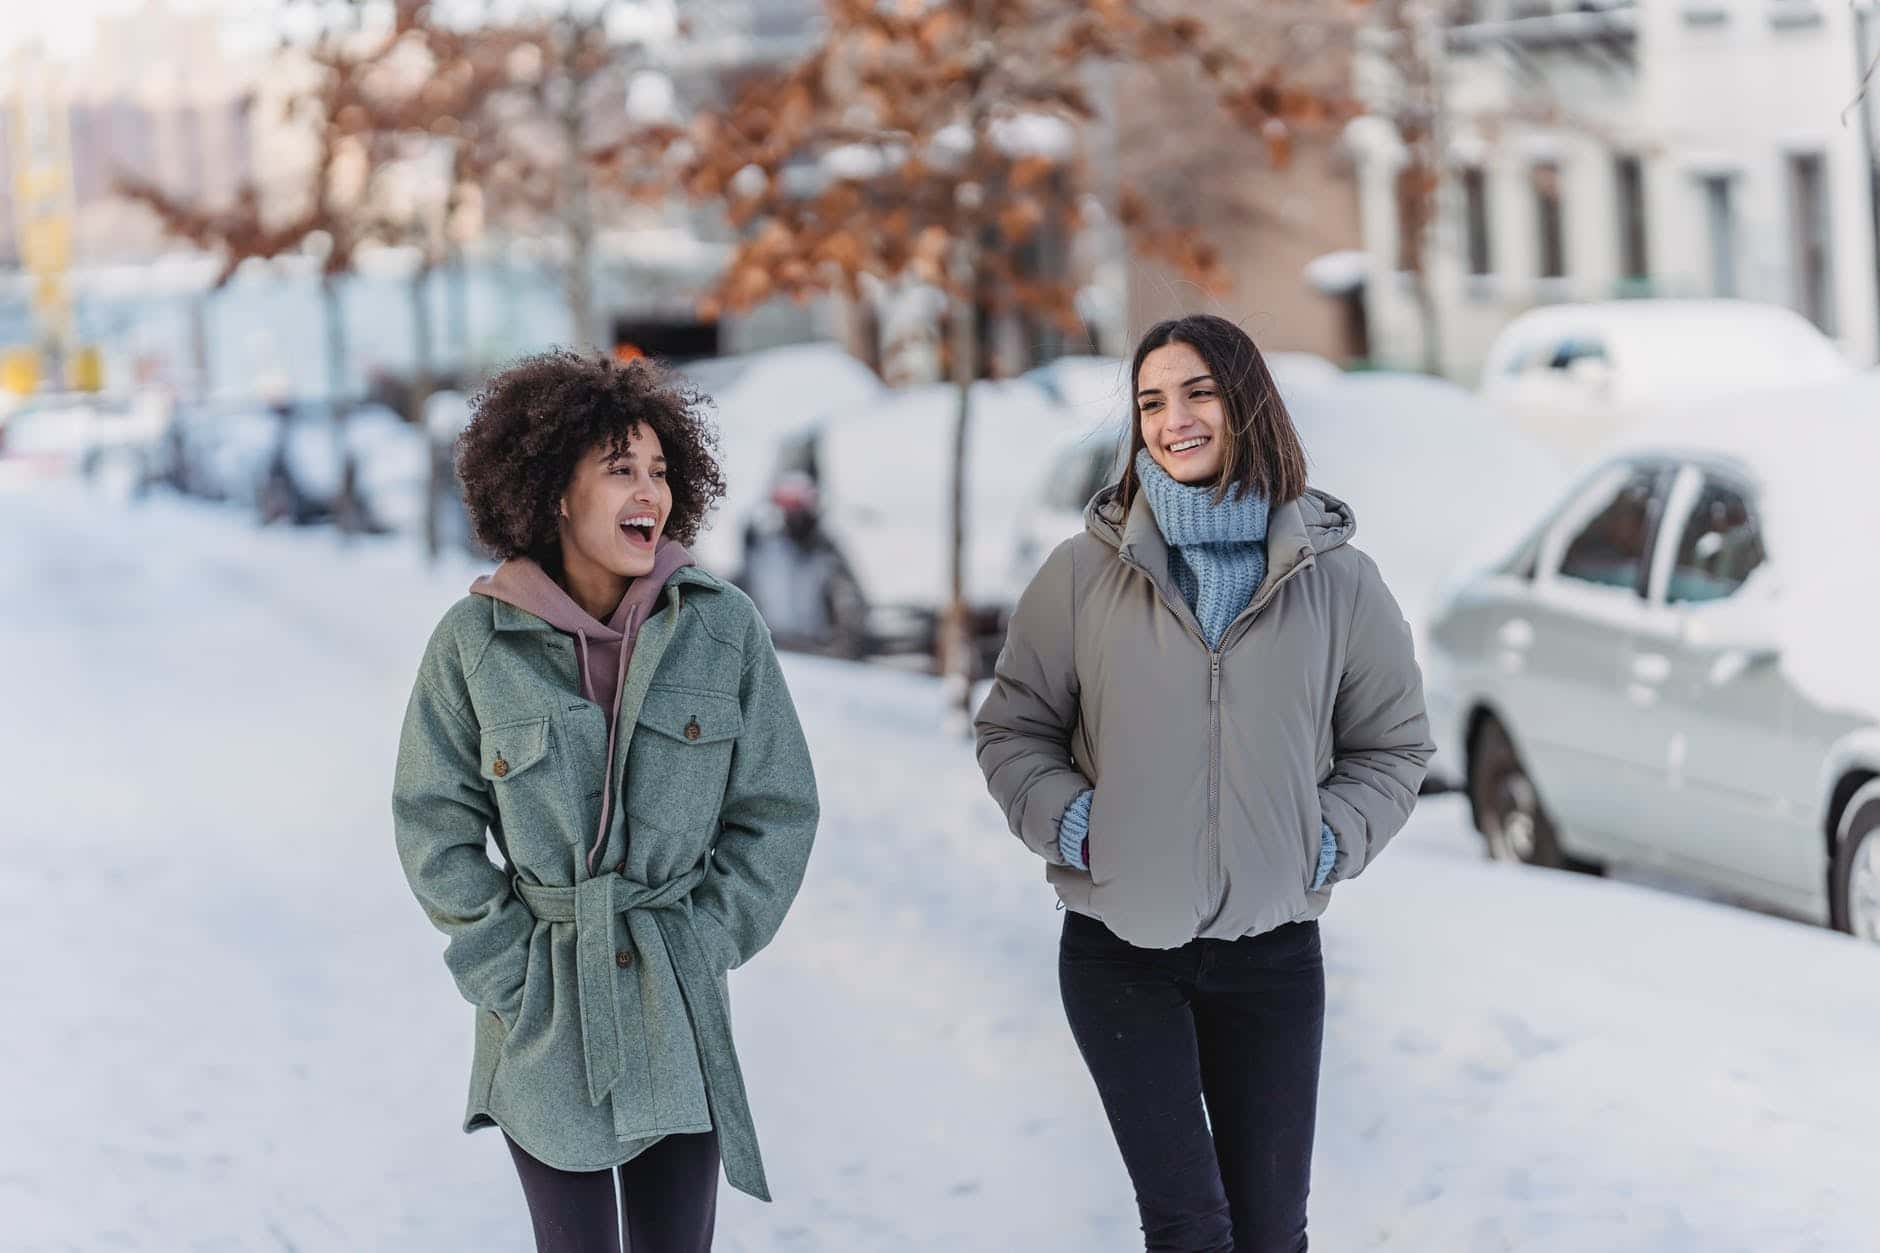 hiver copines neige avoir froid